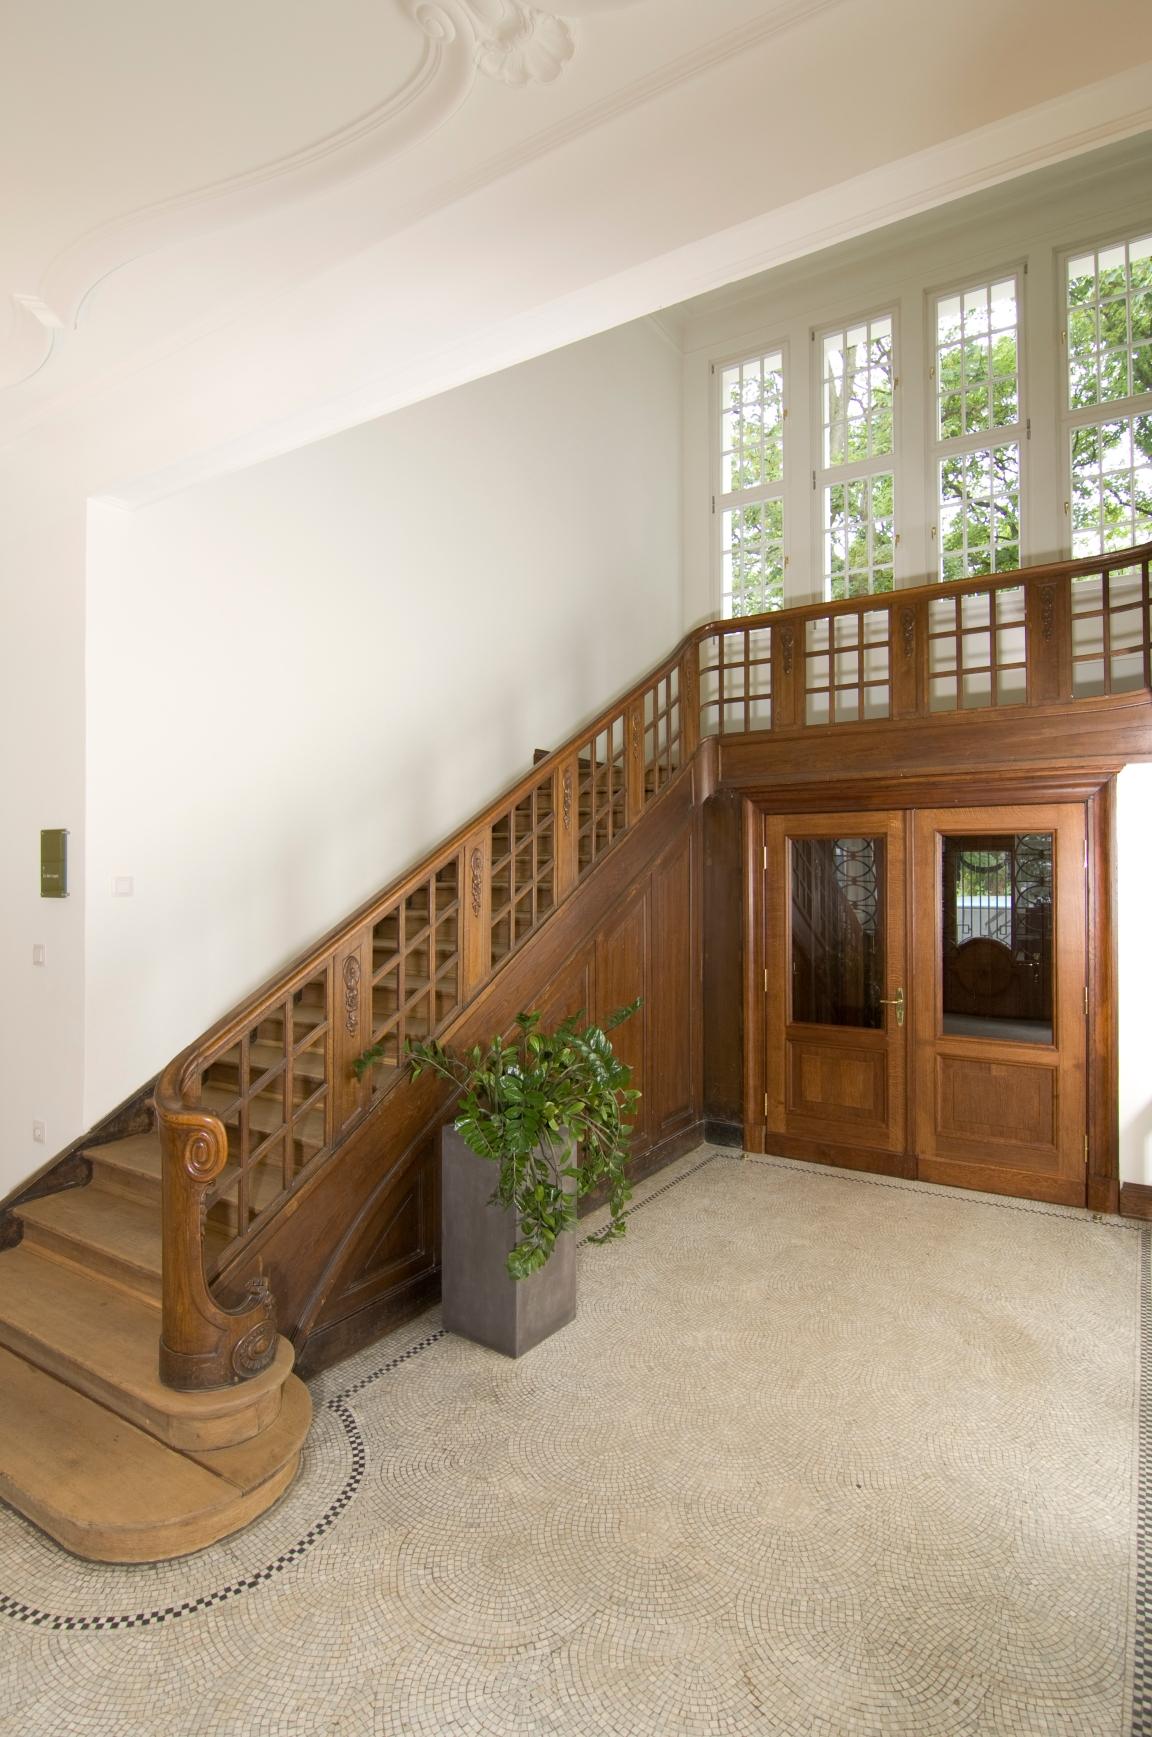 Treppe, Tür, Kamin, Raum